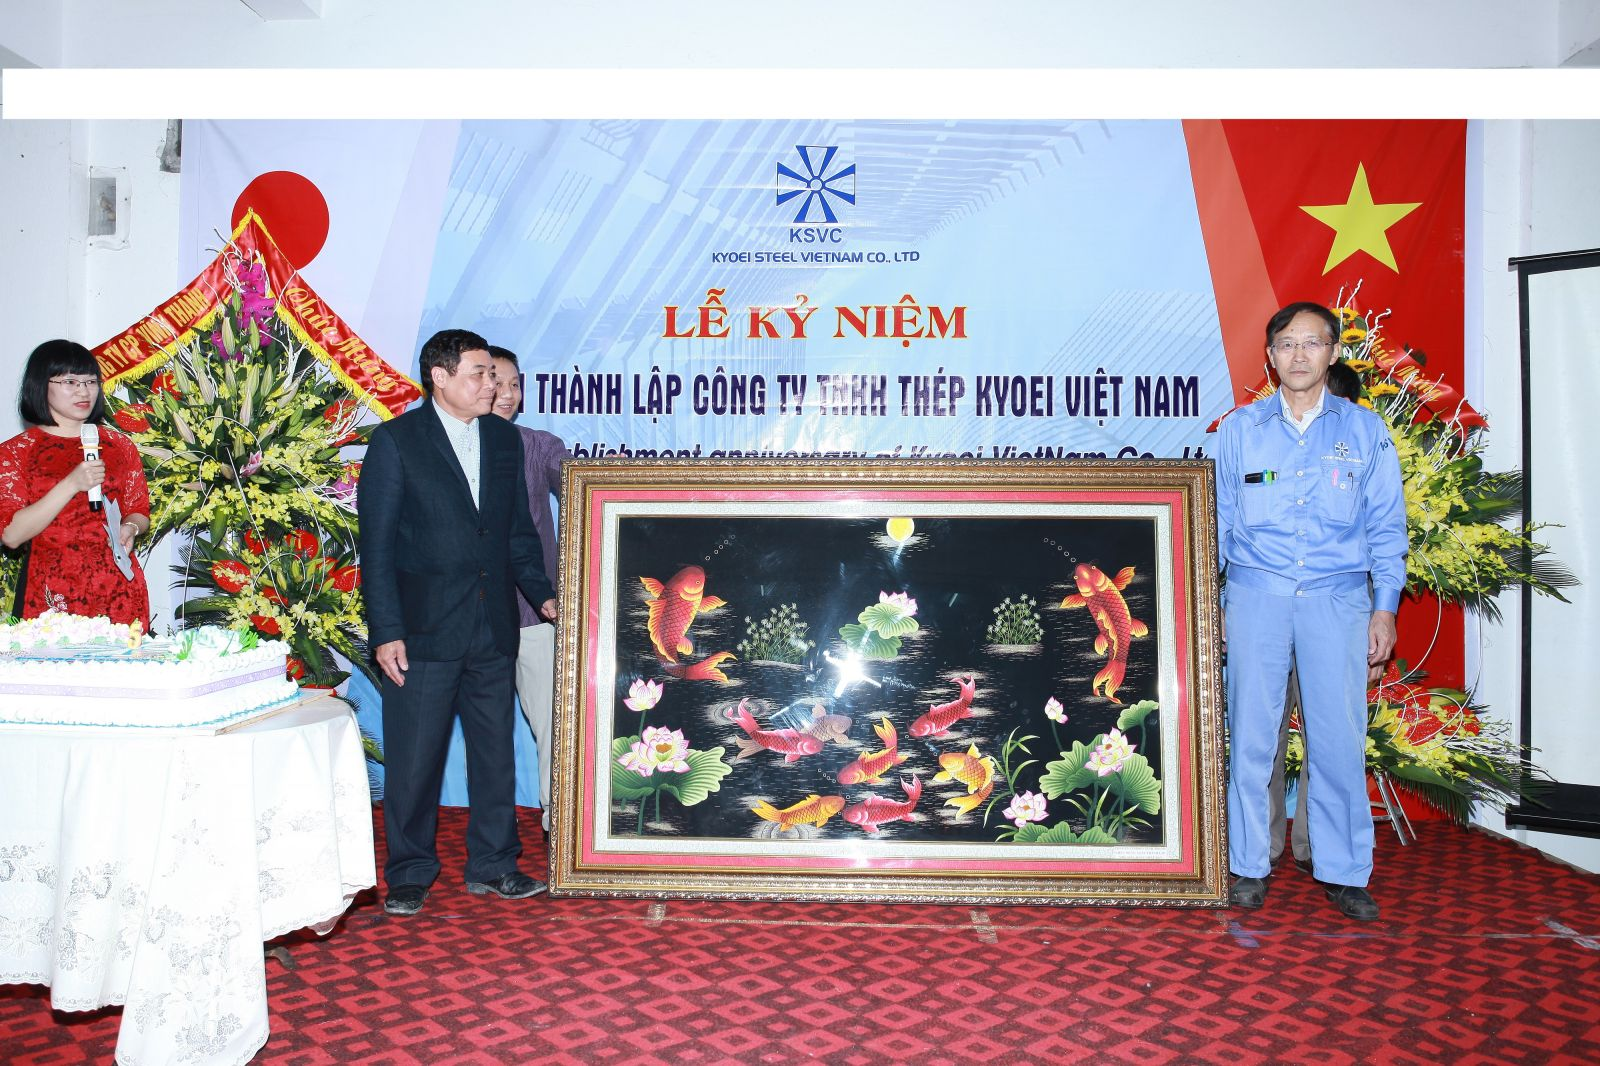 Kyoei Việt Nam